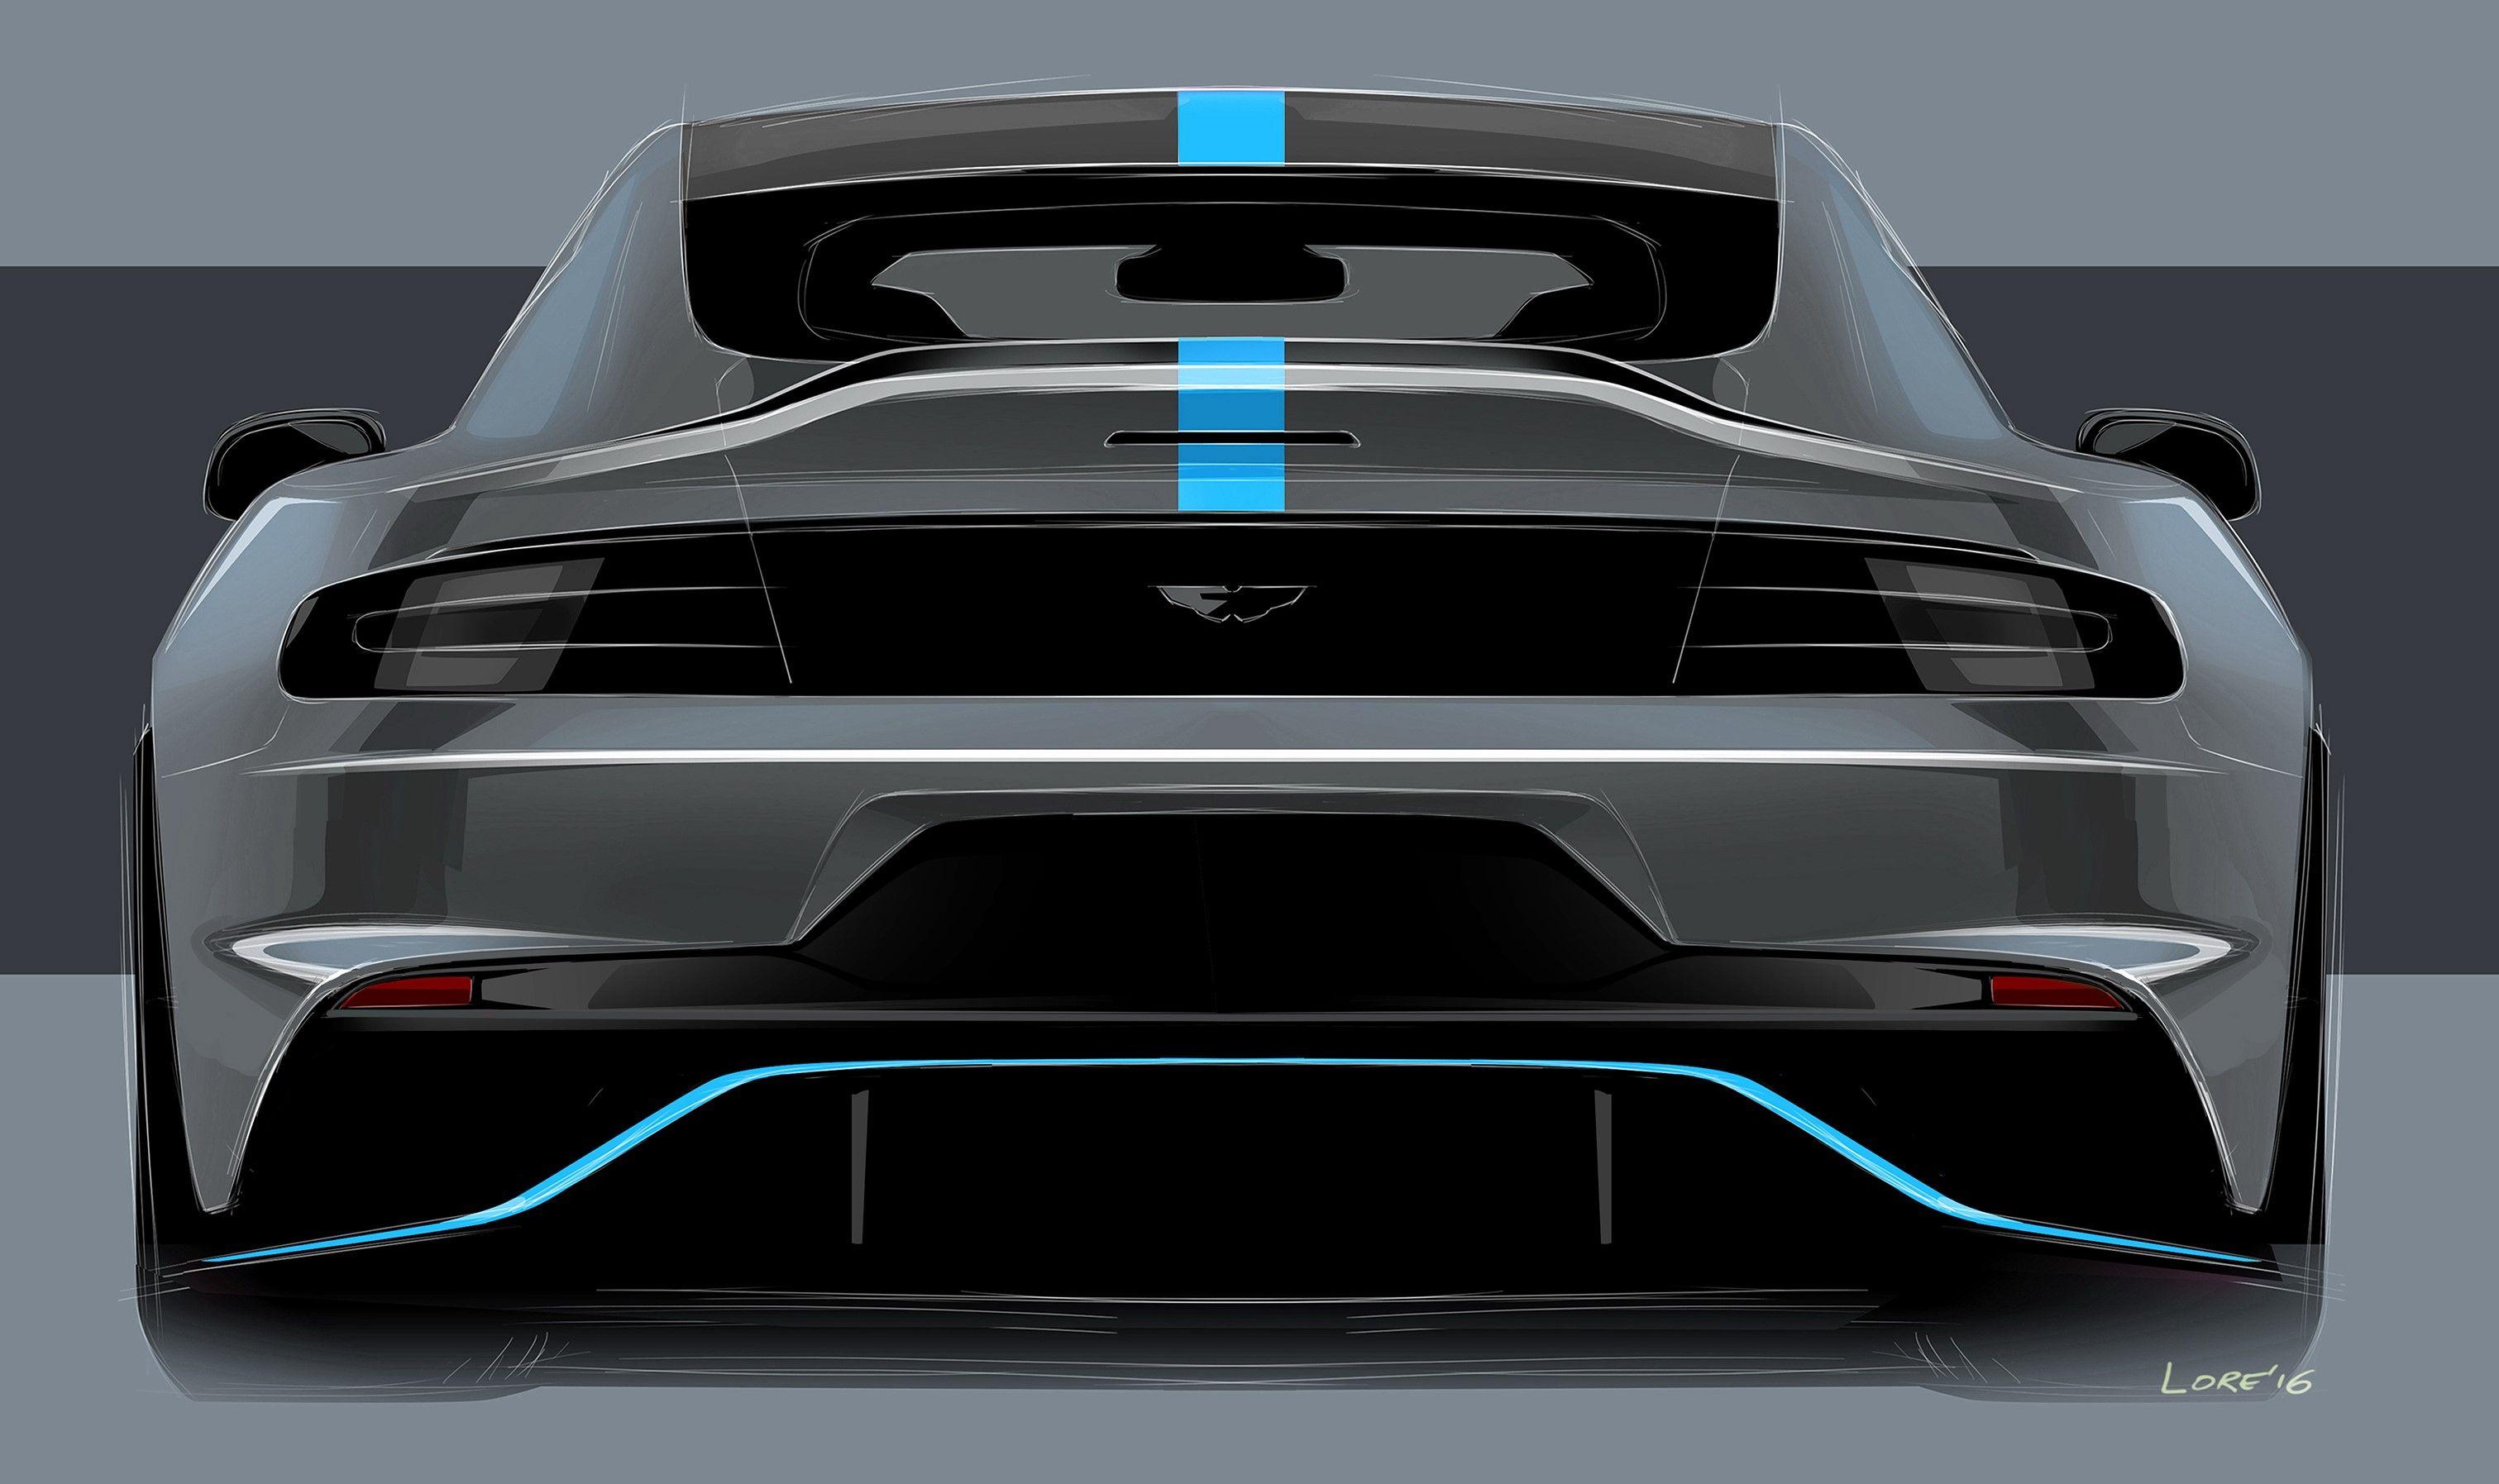 Aston Martin Says Its Fleet Will Go All Hybrid Aston Martin Rapide Aston Martin Hybrid Car